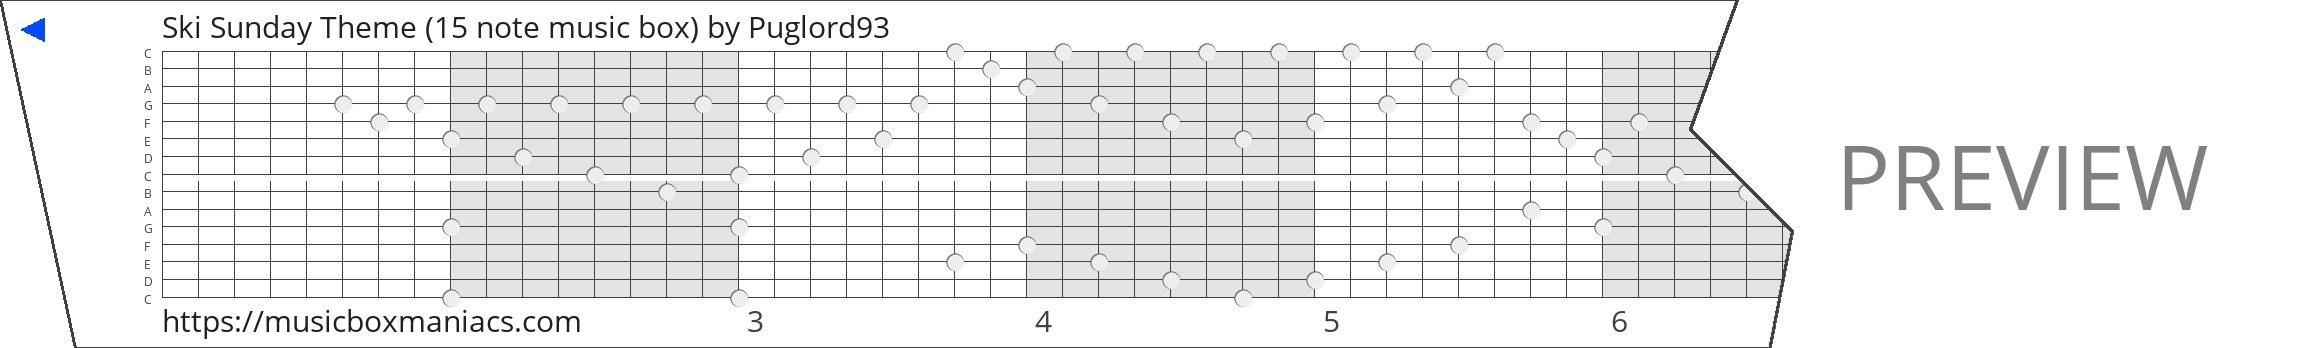 Ski Sunday Theme (15 note music box) 15 note music box paper strip